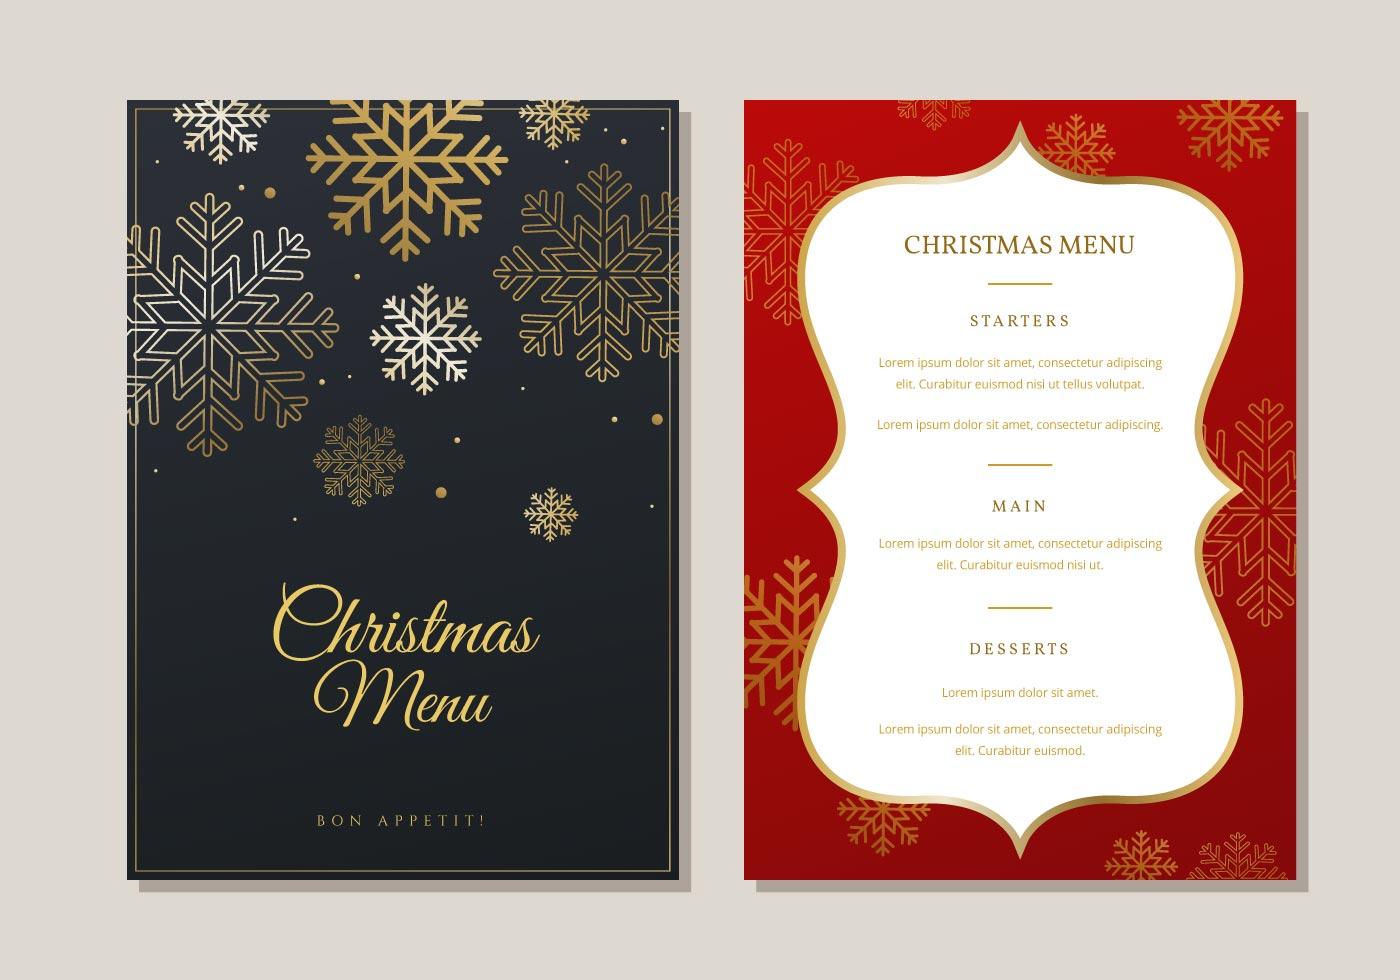 Christmas Menu Dinner Template Download Free Vectors